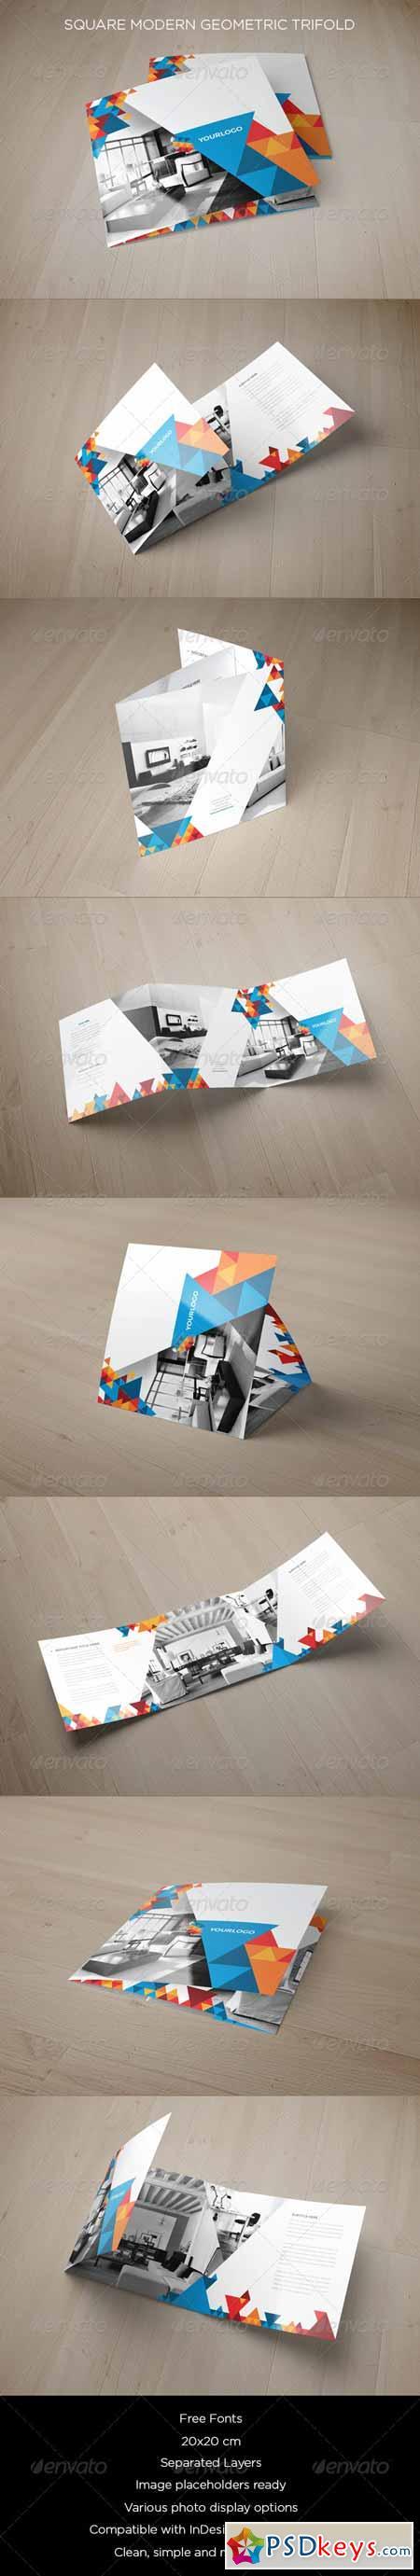 Square Modern Geometric Trifold 8714368